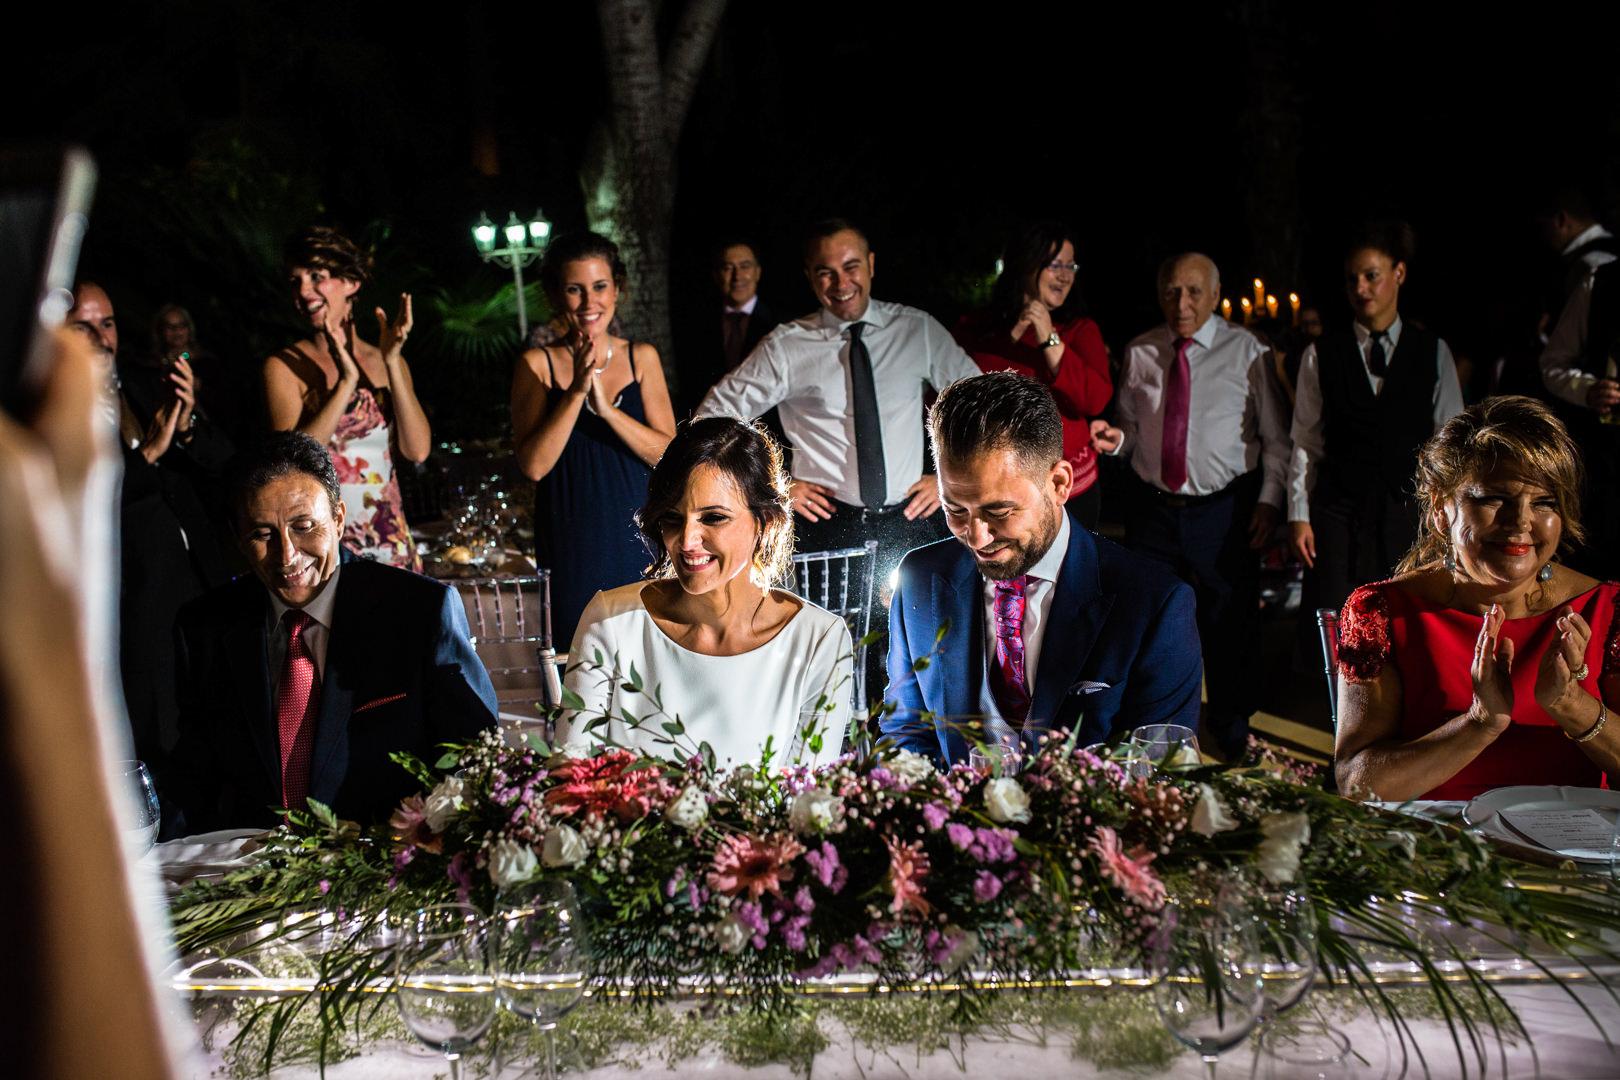 Boda-Irene-Marcos-Dos-Hermanas-Finca-Clotidle-engagement-Rafael-Torres-fotografo-bodas-sevilla-madrid-barcelona-wedding-photographer--33.jpg